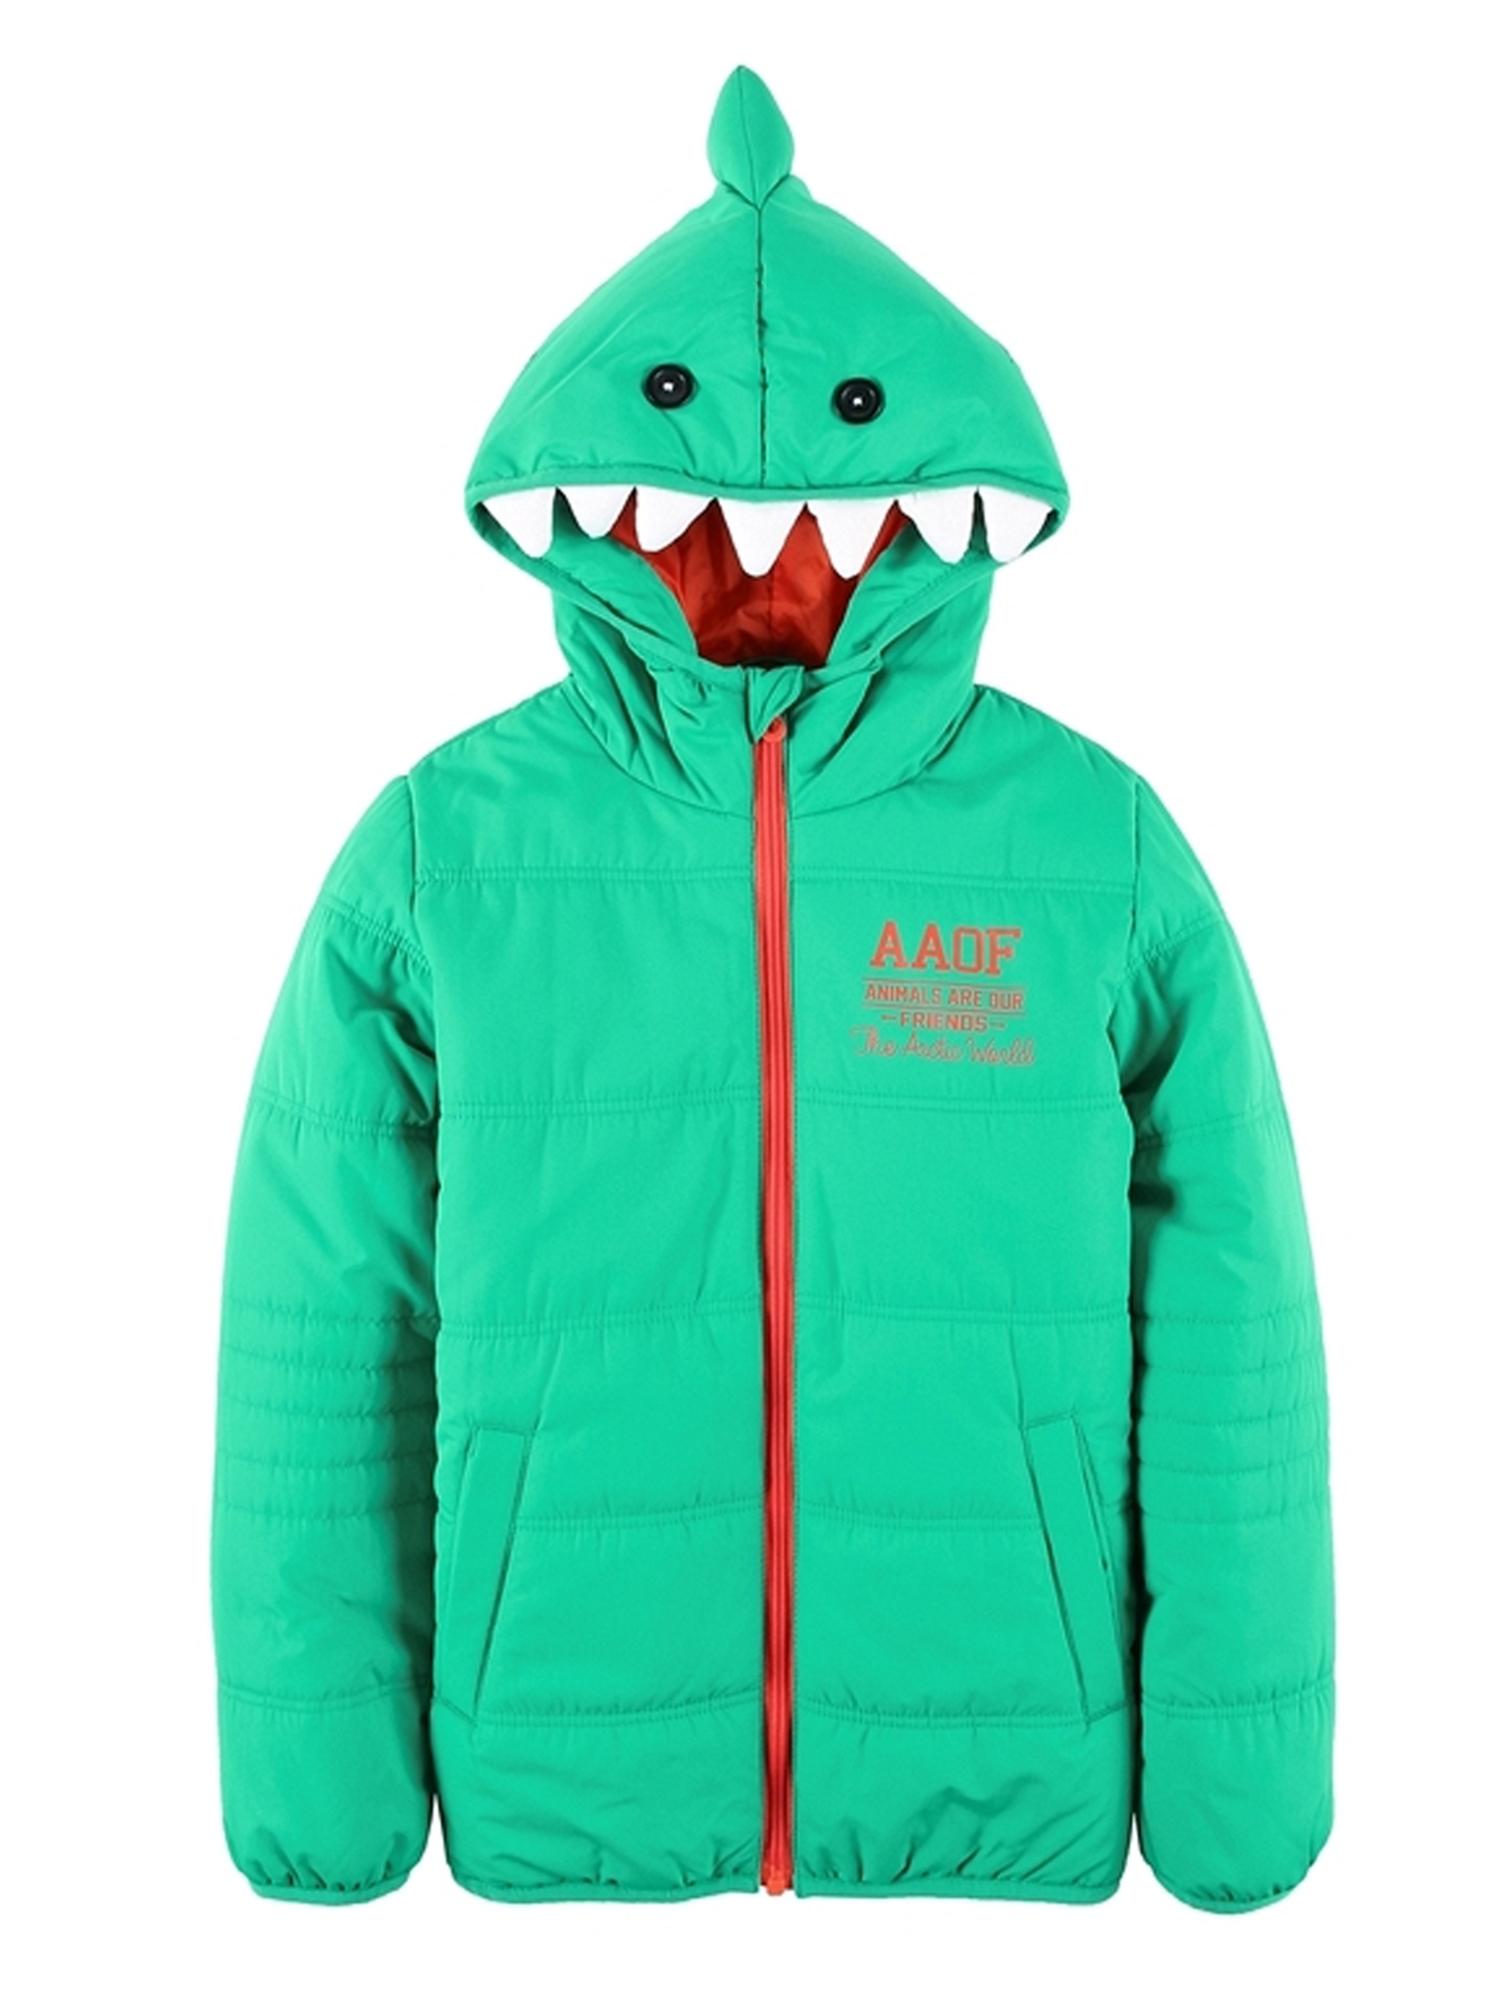 [GIORDANO]恐竜パデッドジャケット